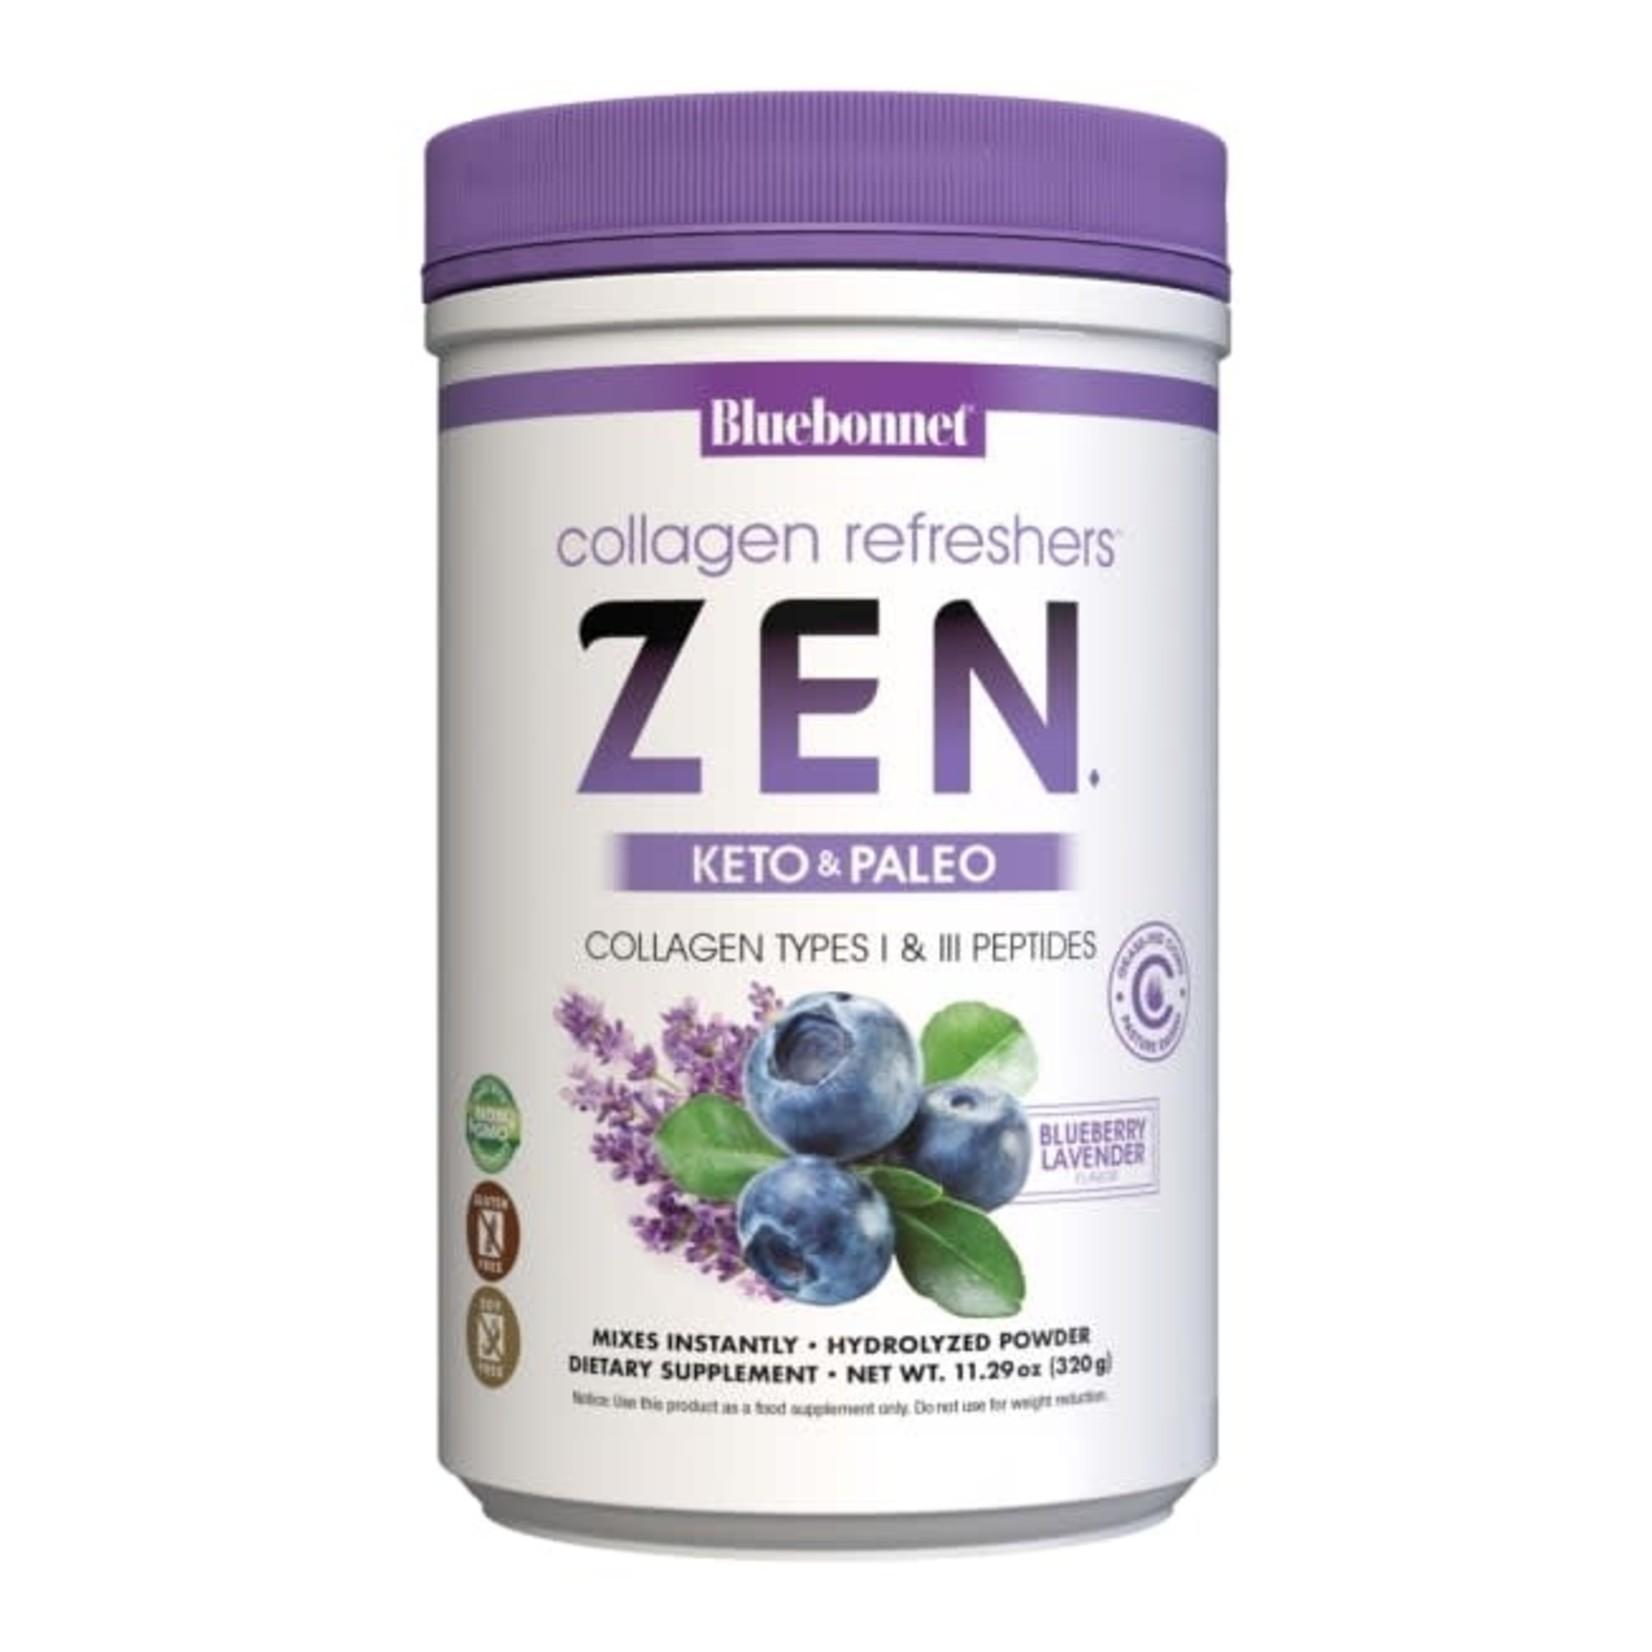 BlueBonnet Bluebonnet Collagen Refreshers Keto & Paleo 11.29oz Powder